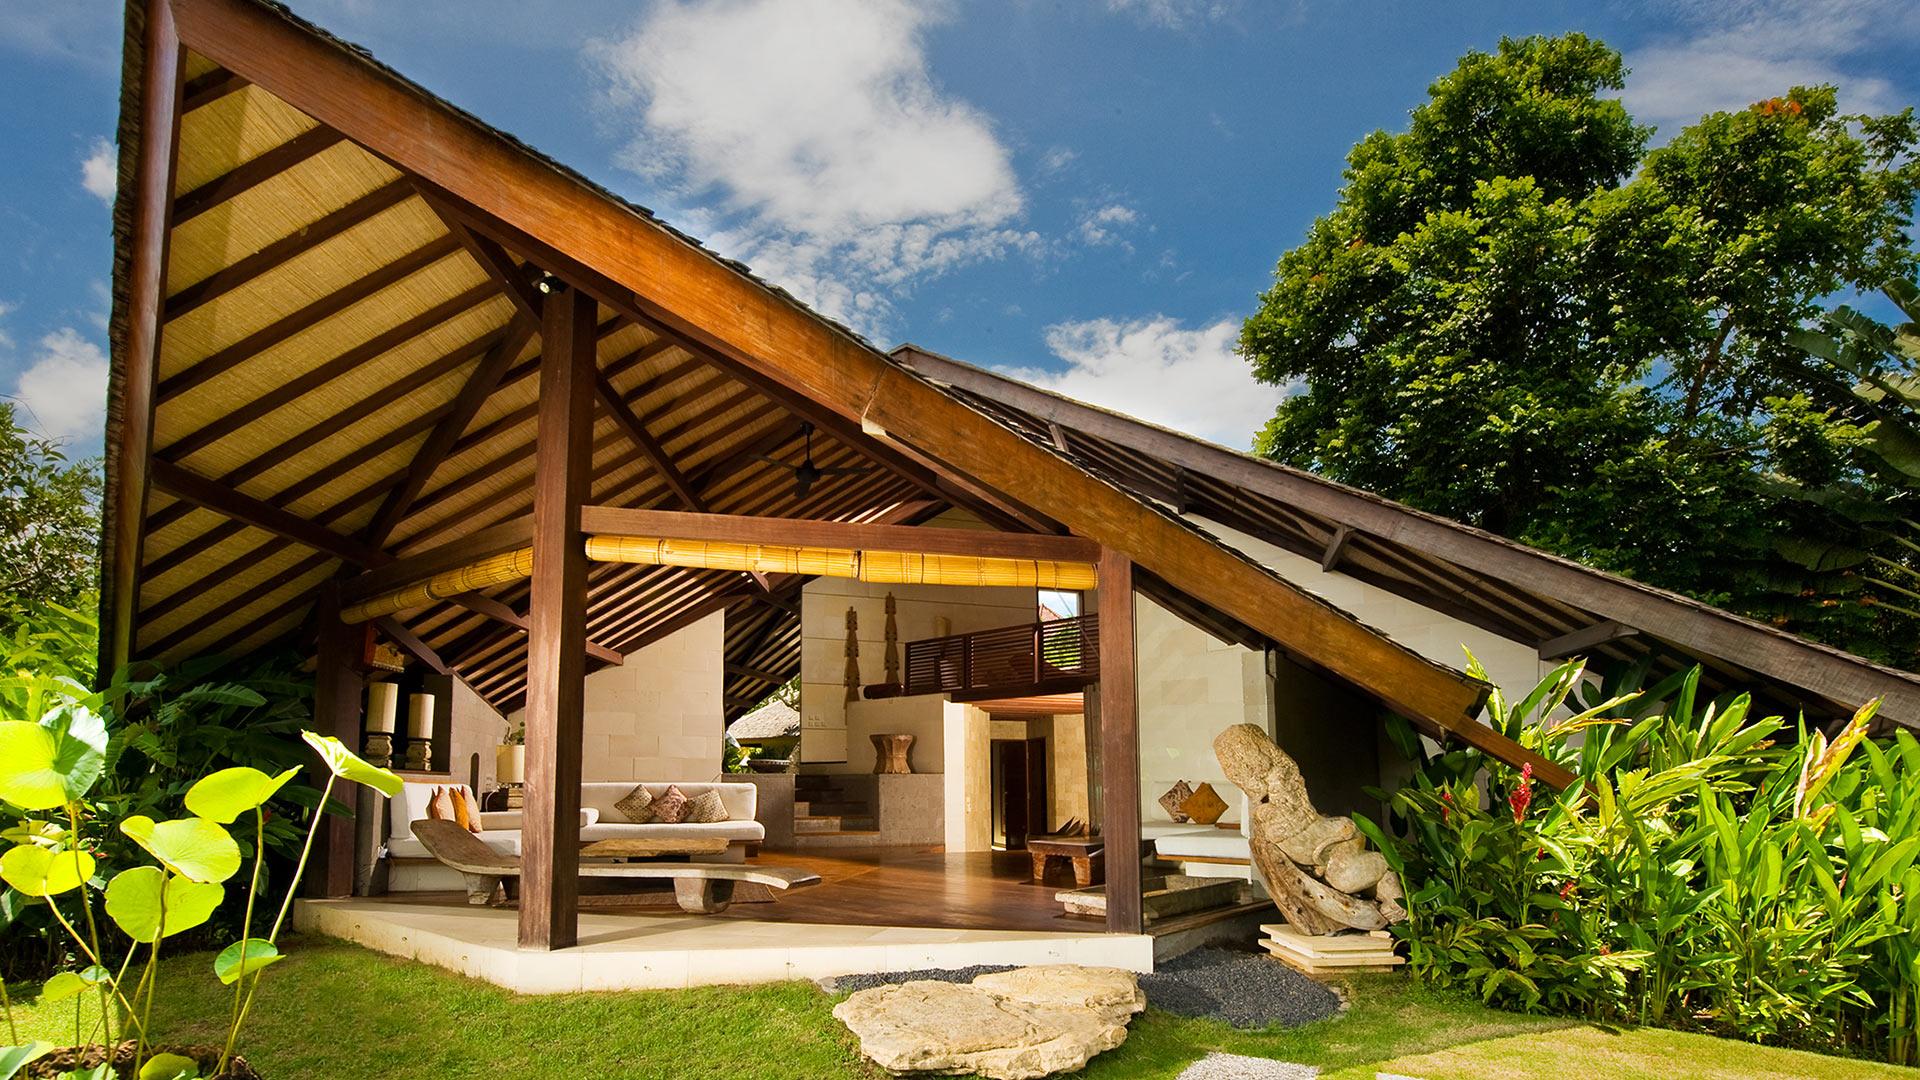 Villa Villas Bali-Bali, Location à Bali